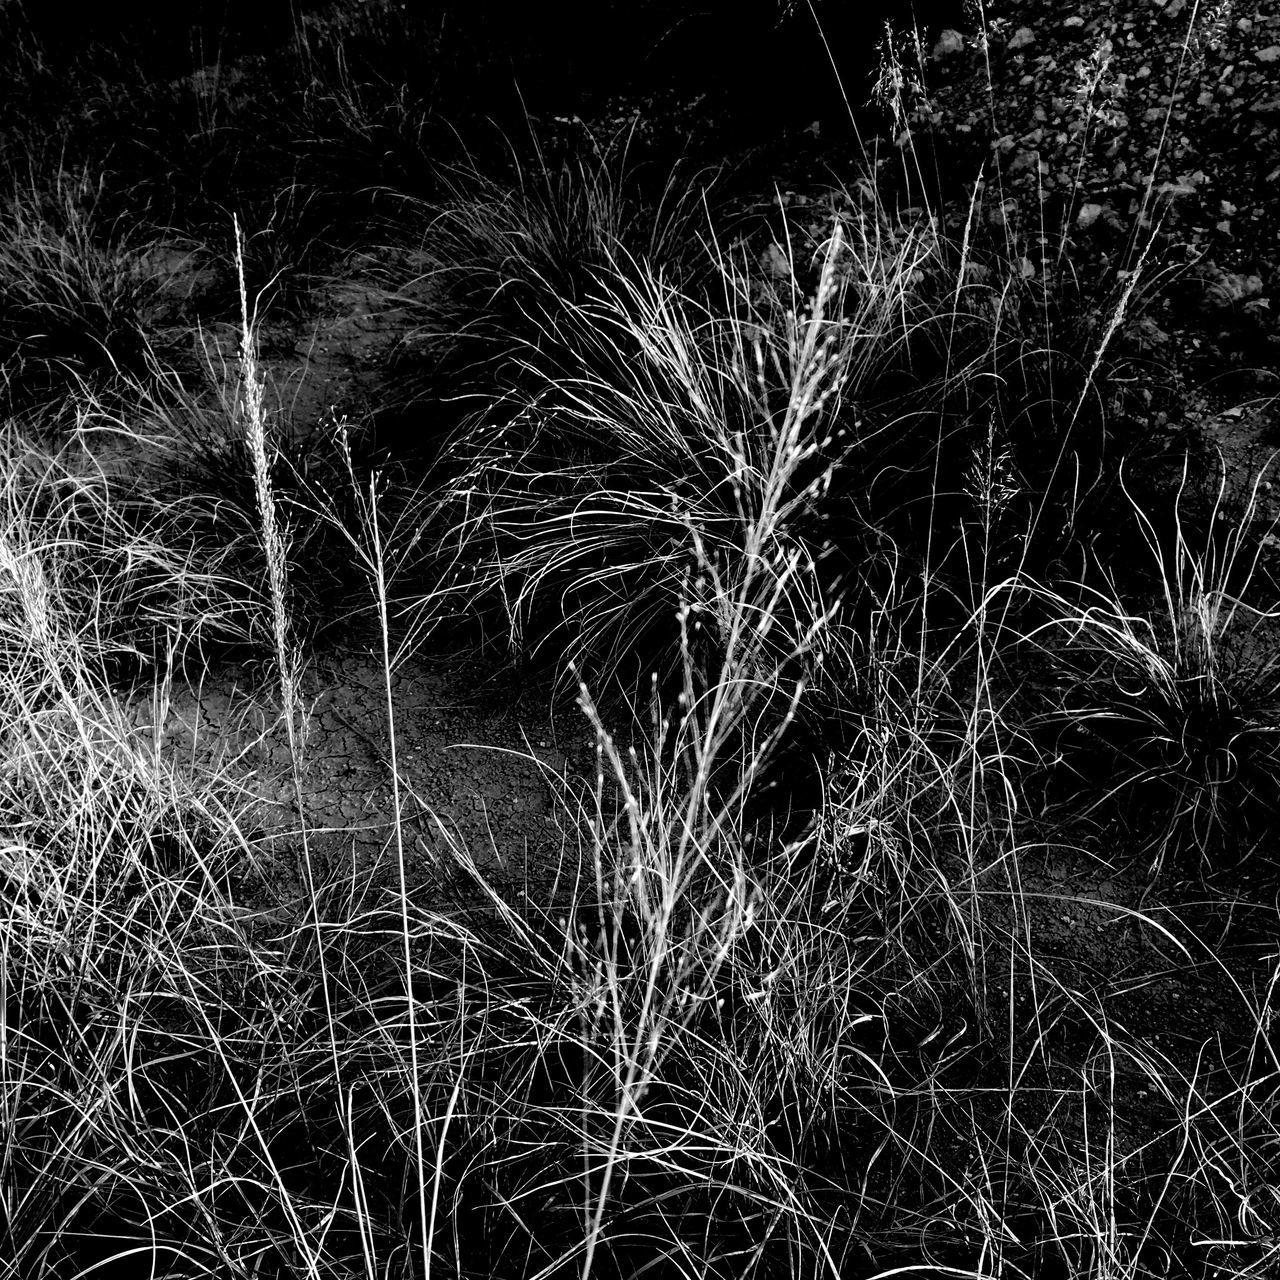 La tarde se despide Nature Beauty In Nature Plant EyeEm Best Shots - Black + White EyeEm Best Shots Beauty In Nature